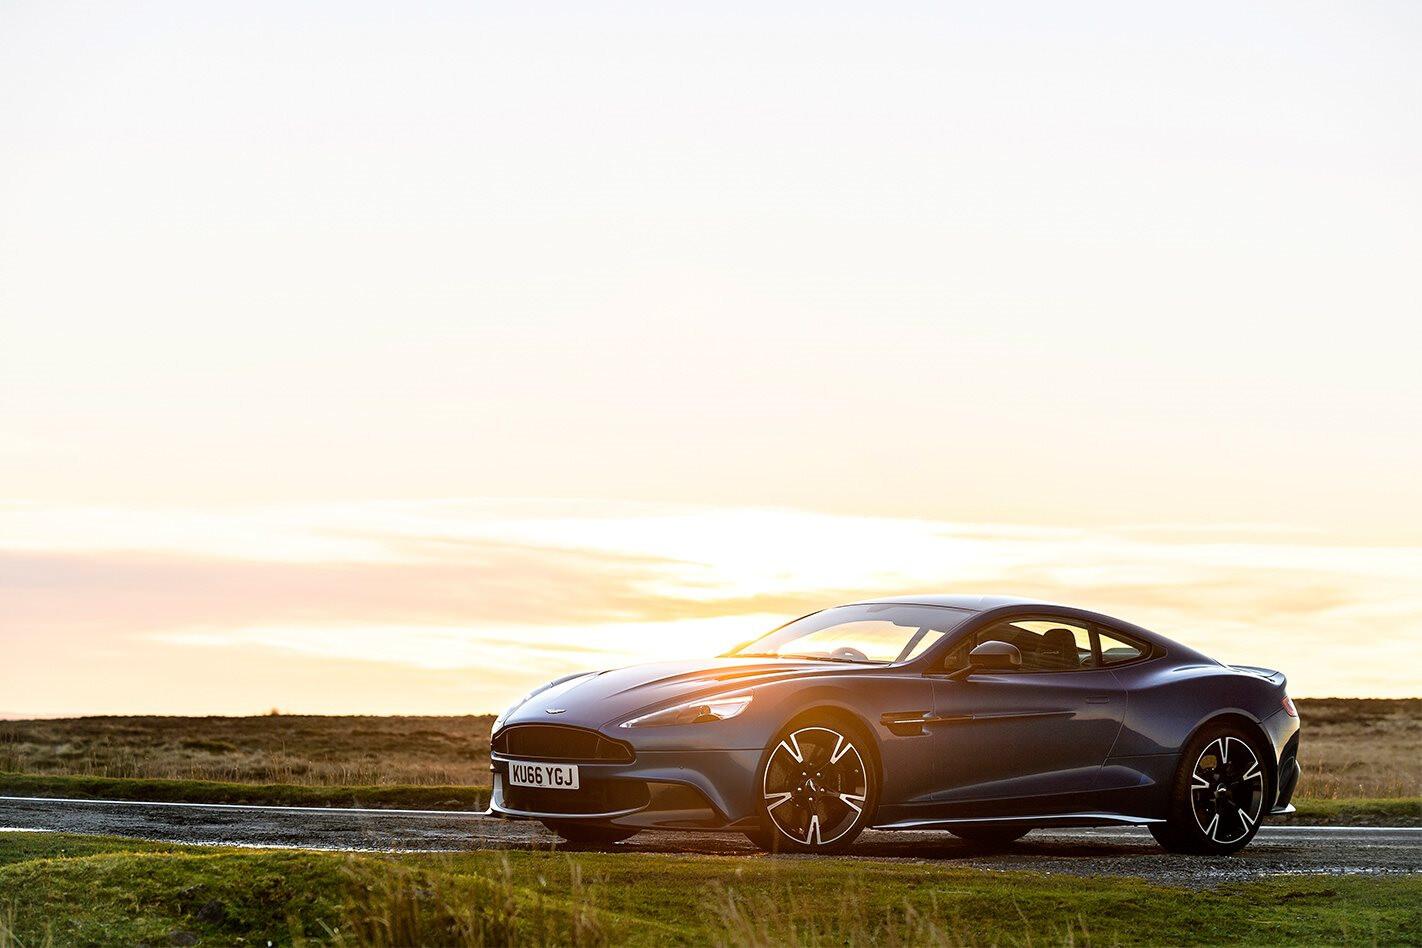 Aston Martin Vanquish S 2017 front side Sunset